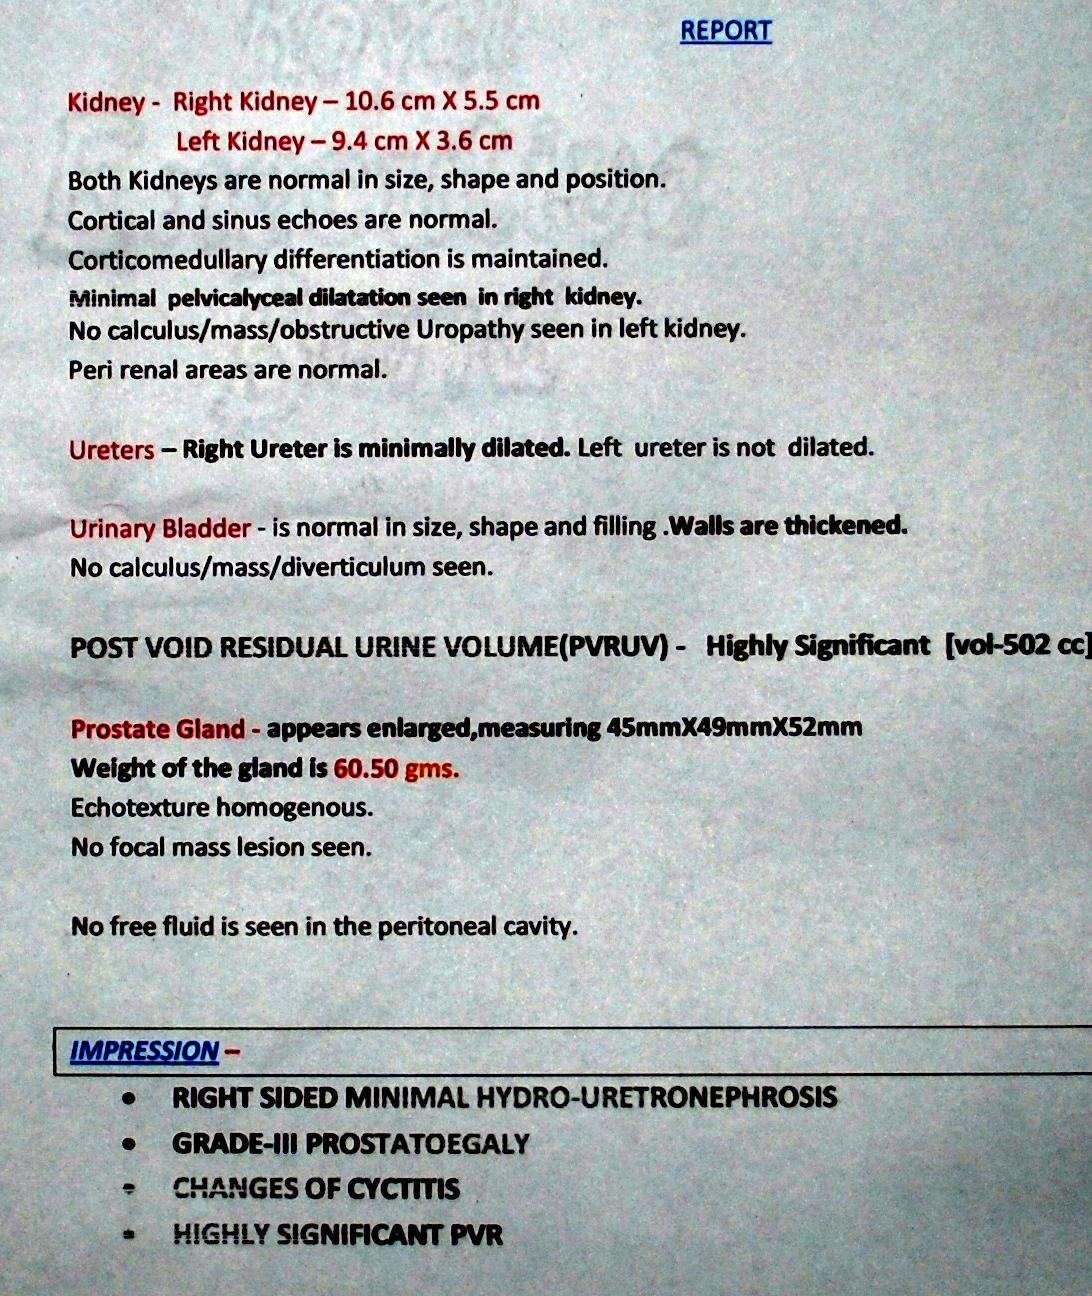 Avodart Abdominal Pain Upper Side Effects - Patientsville